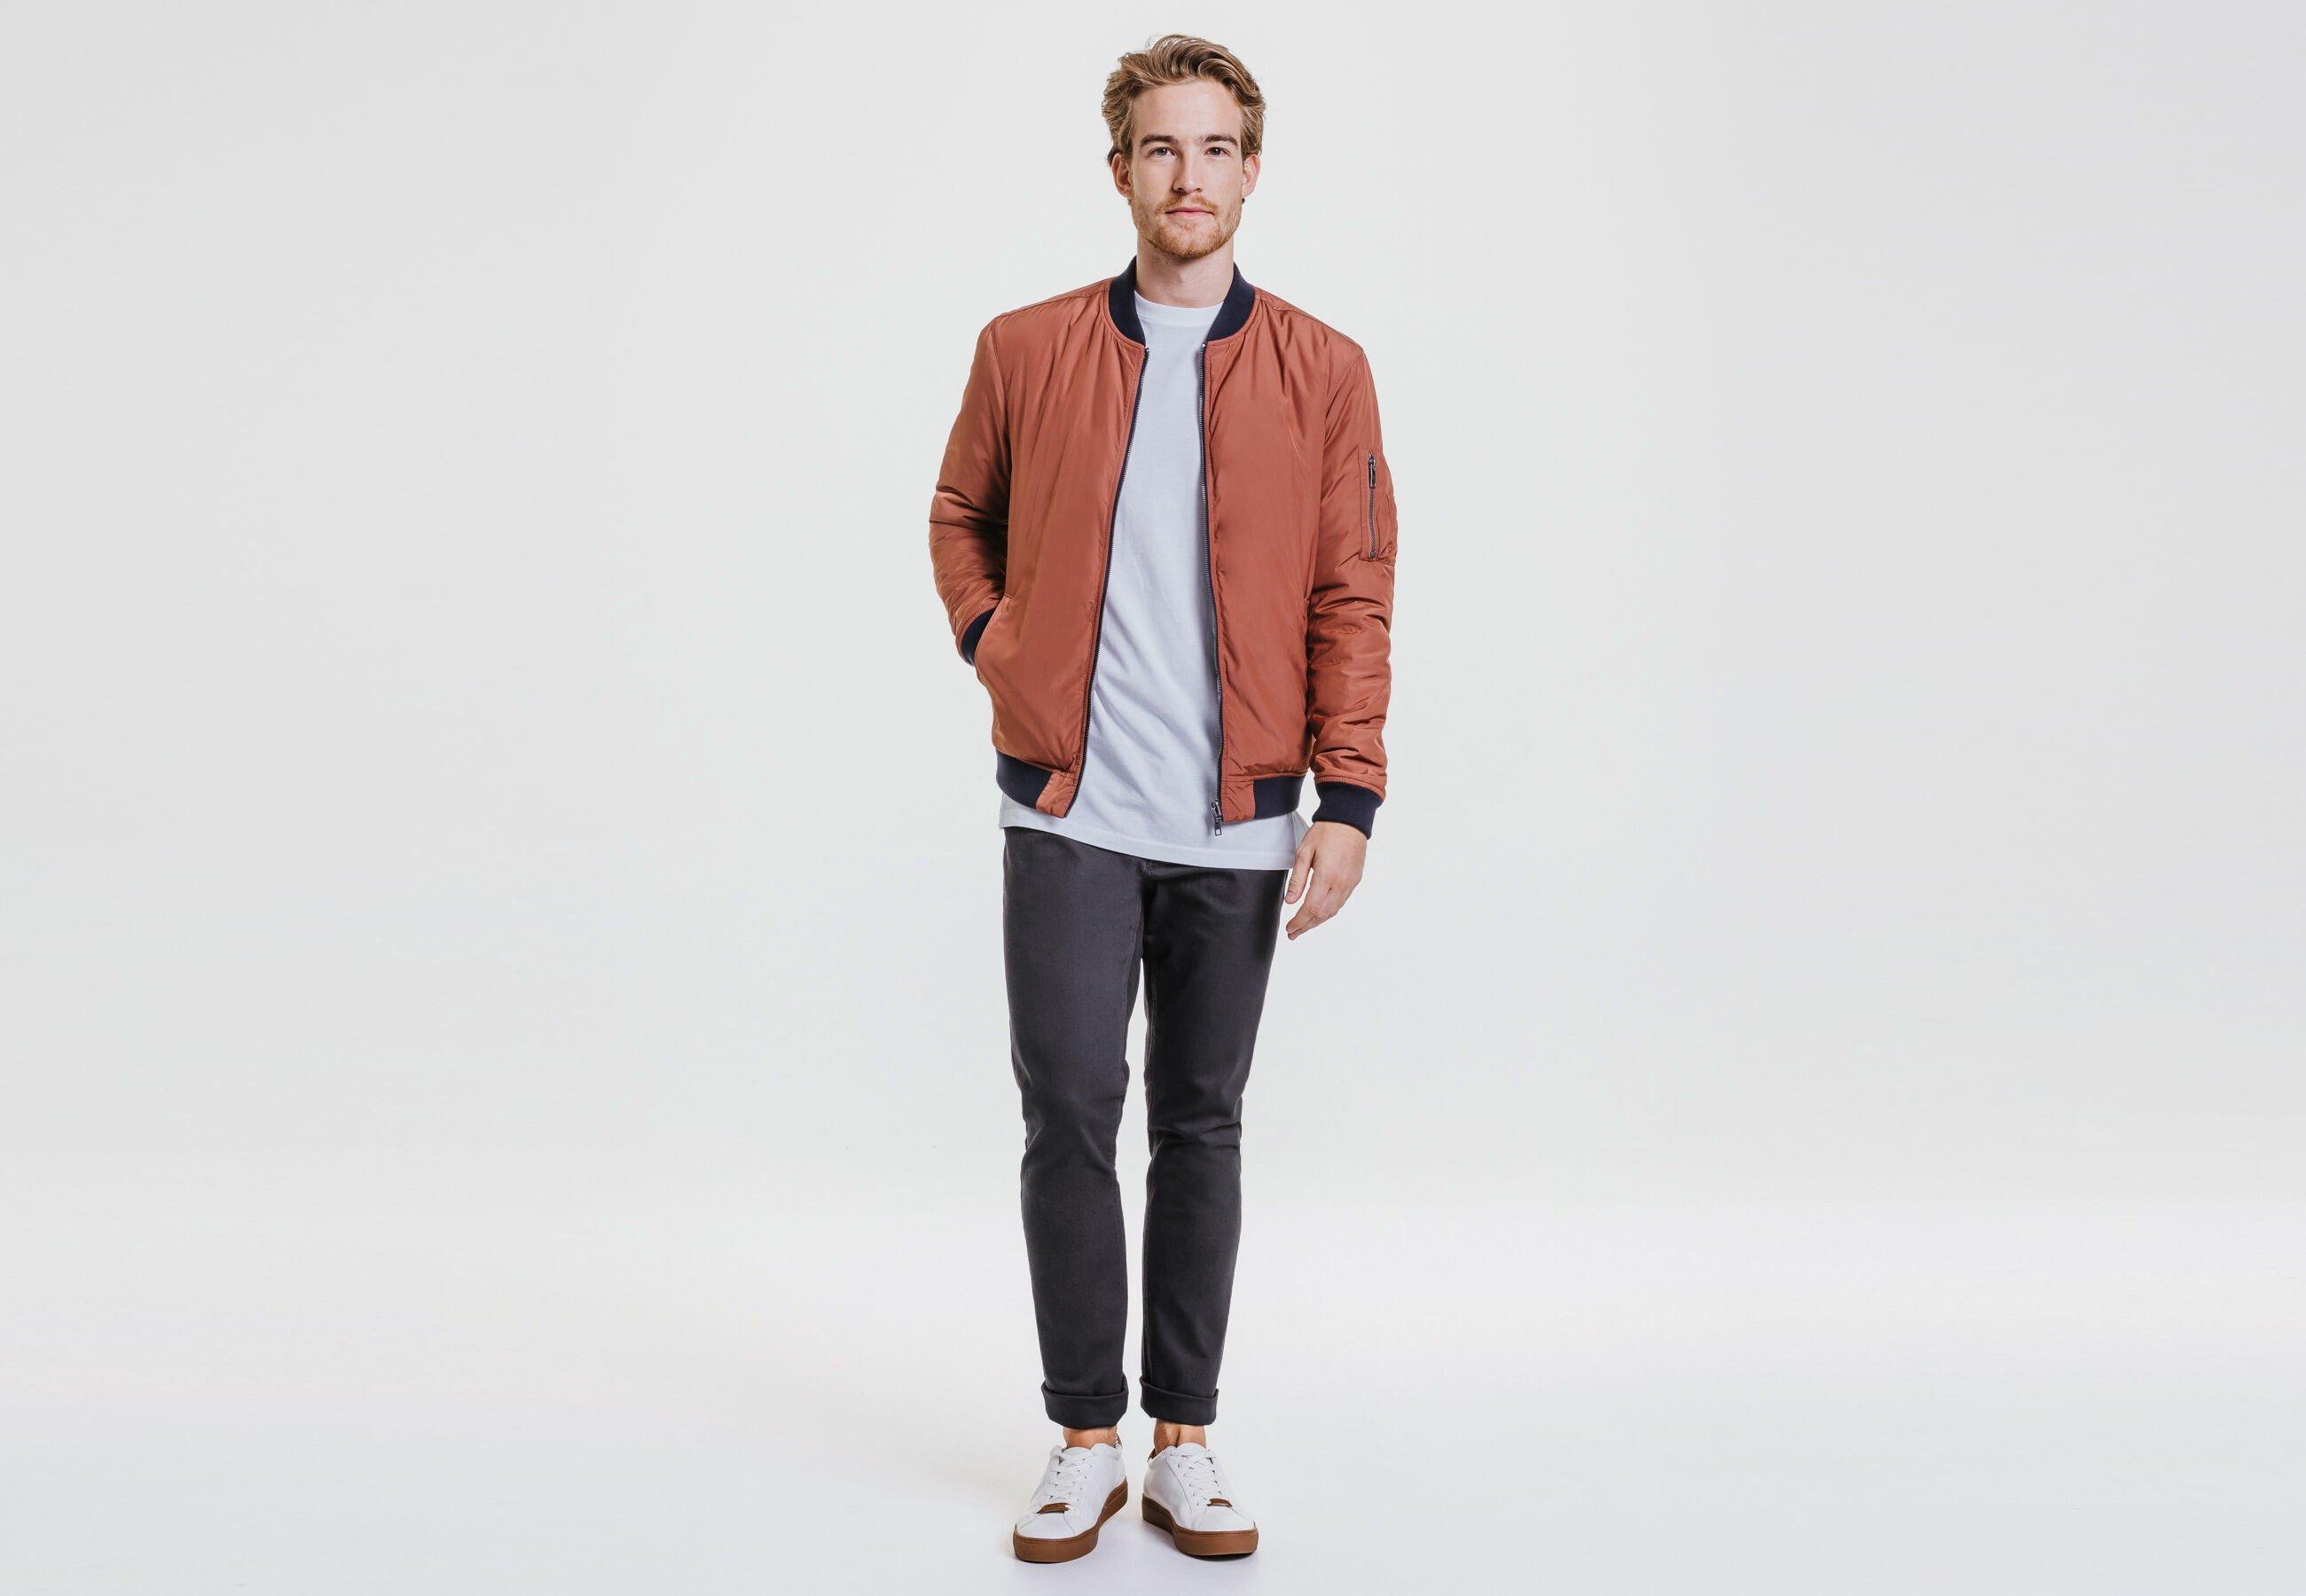 pantalon 5 poches slim coton stretch gris anthracite homme. Black Bedroom Furniture Sets. Home Design Ideas